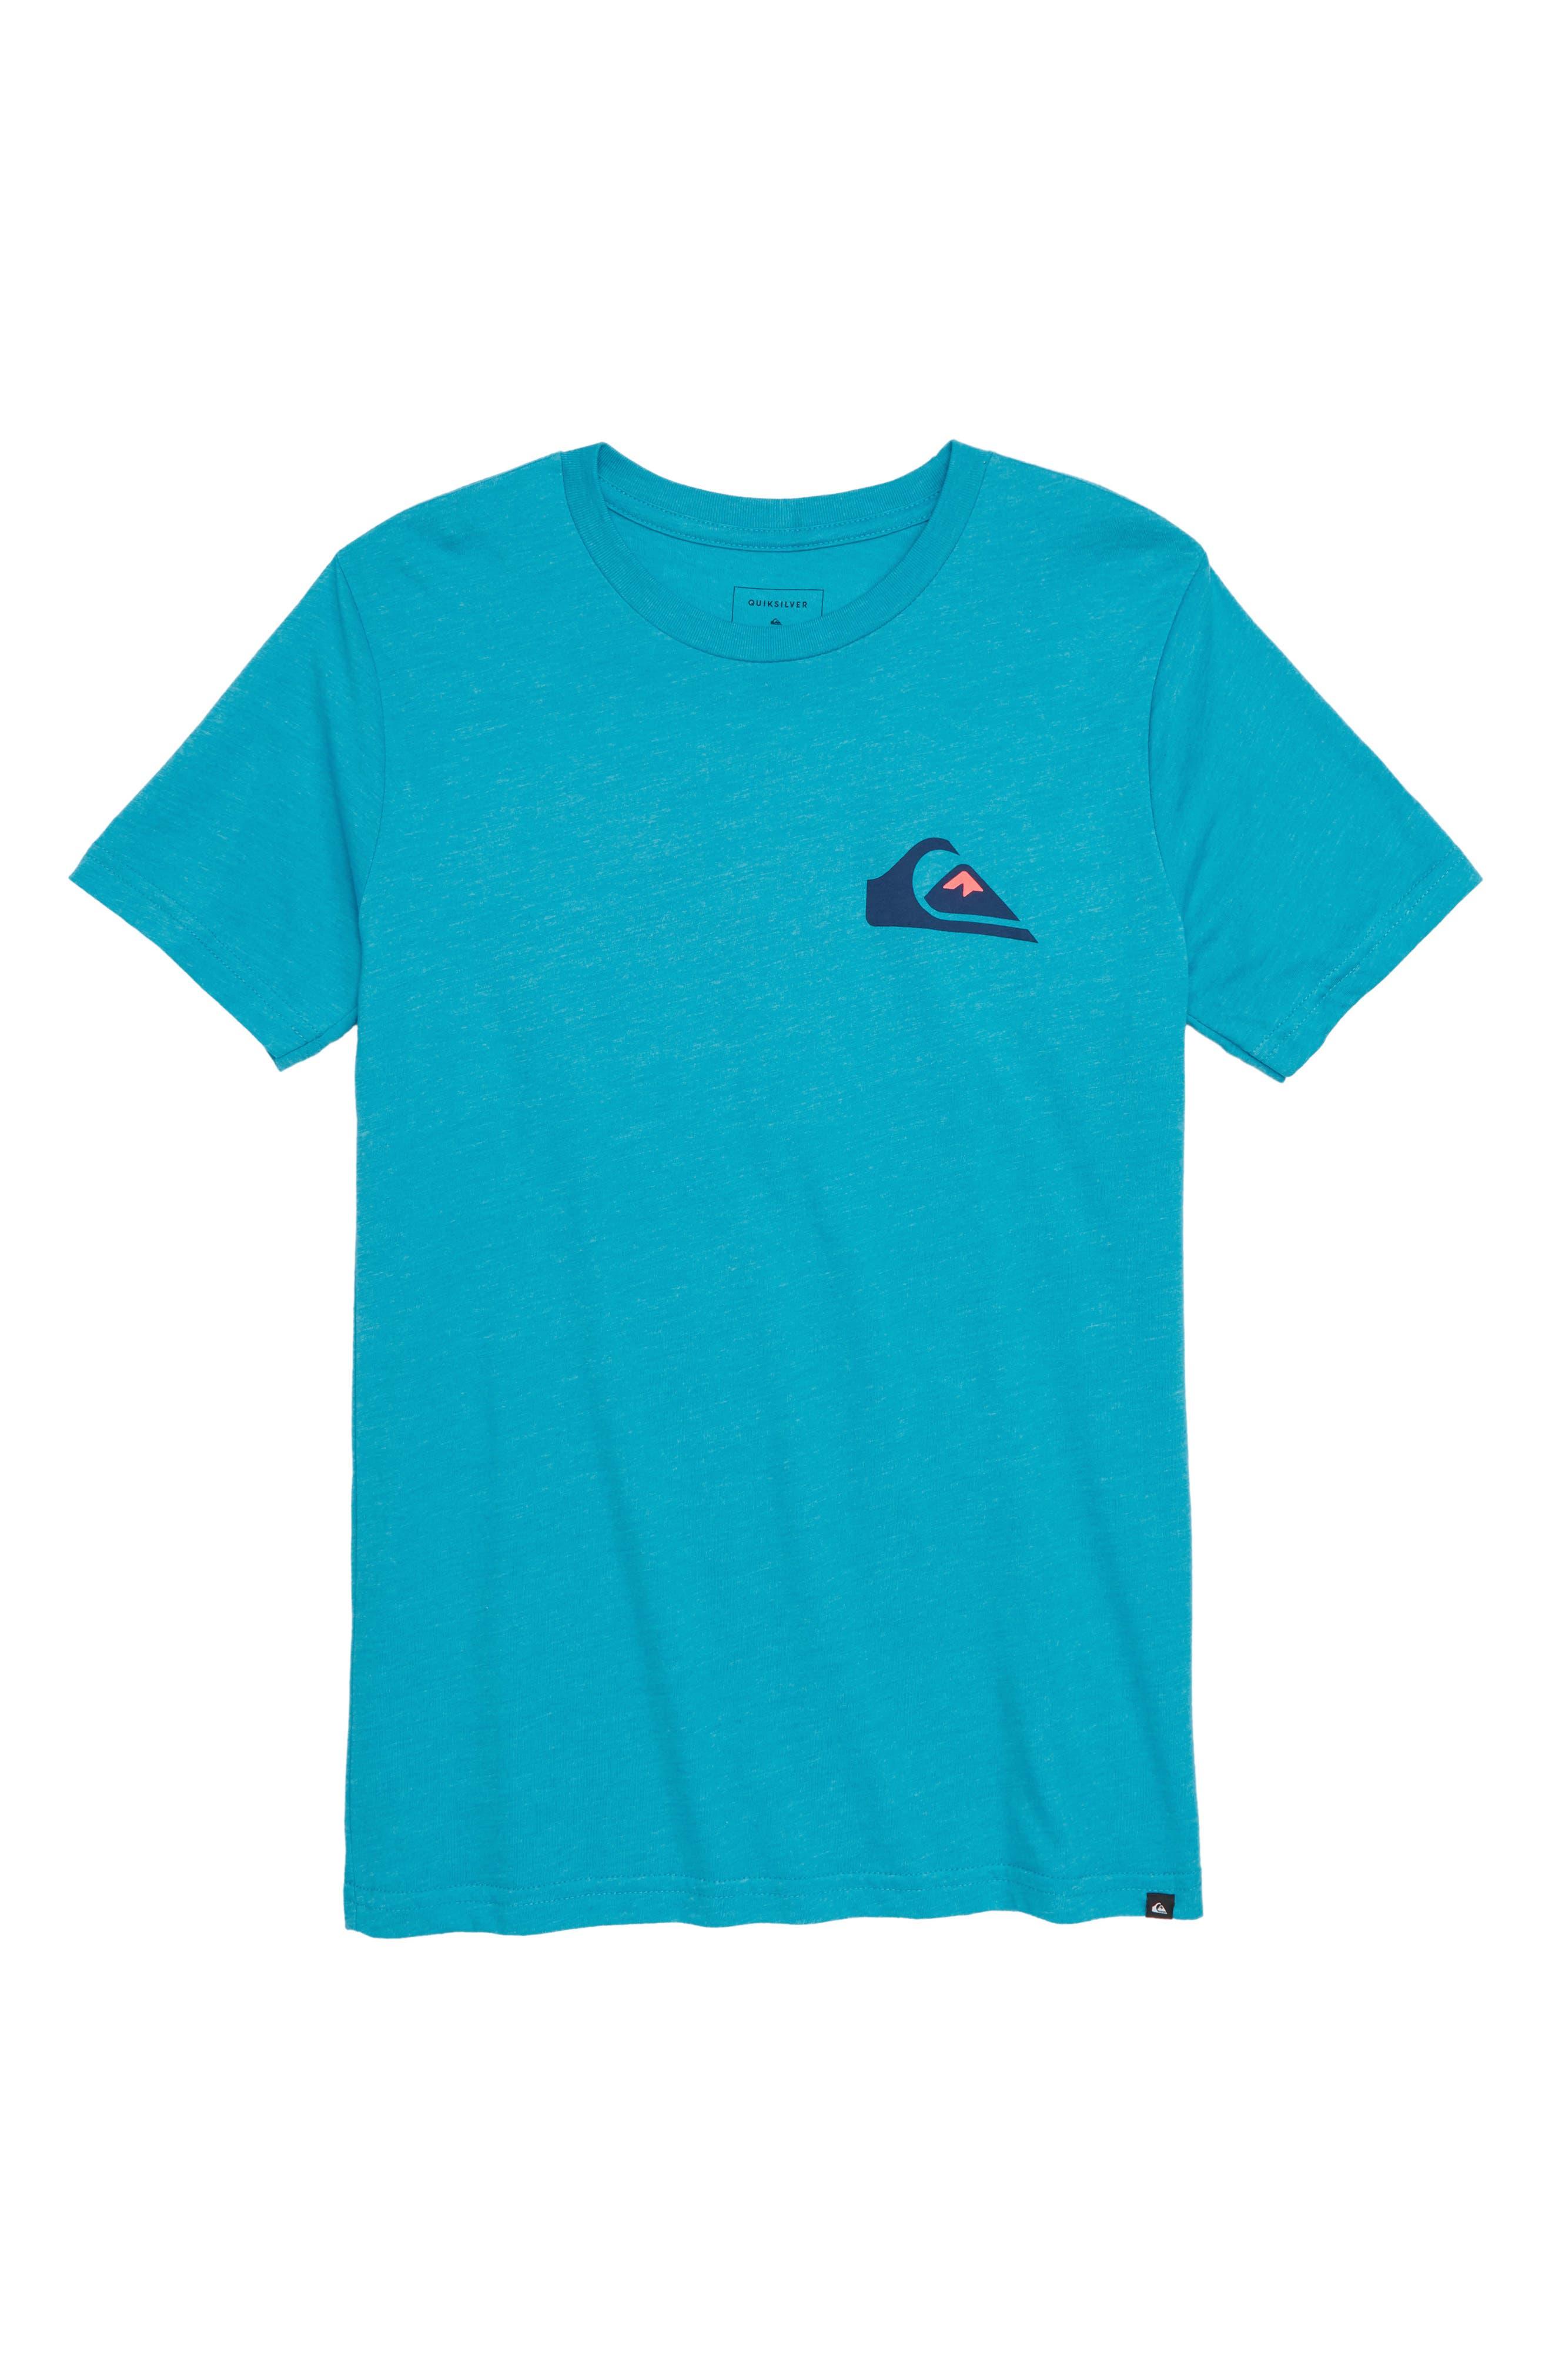 Vice Versa Graphic T-Shirt,                         Main,                         color, 437